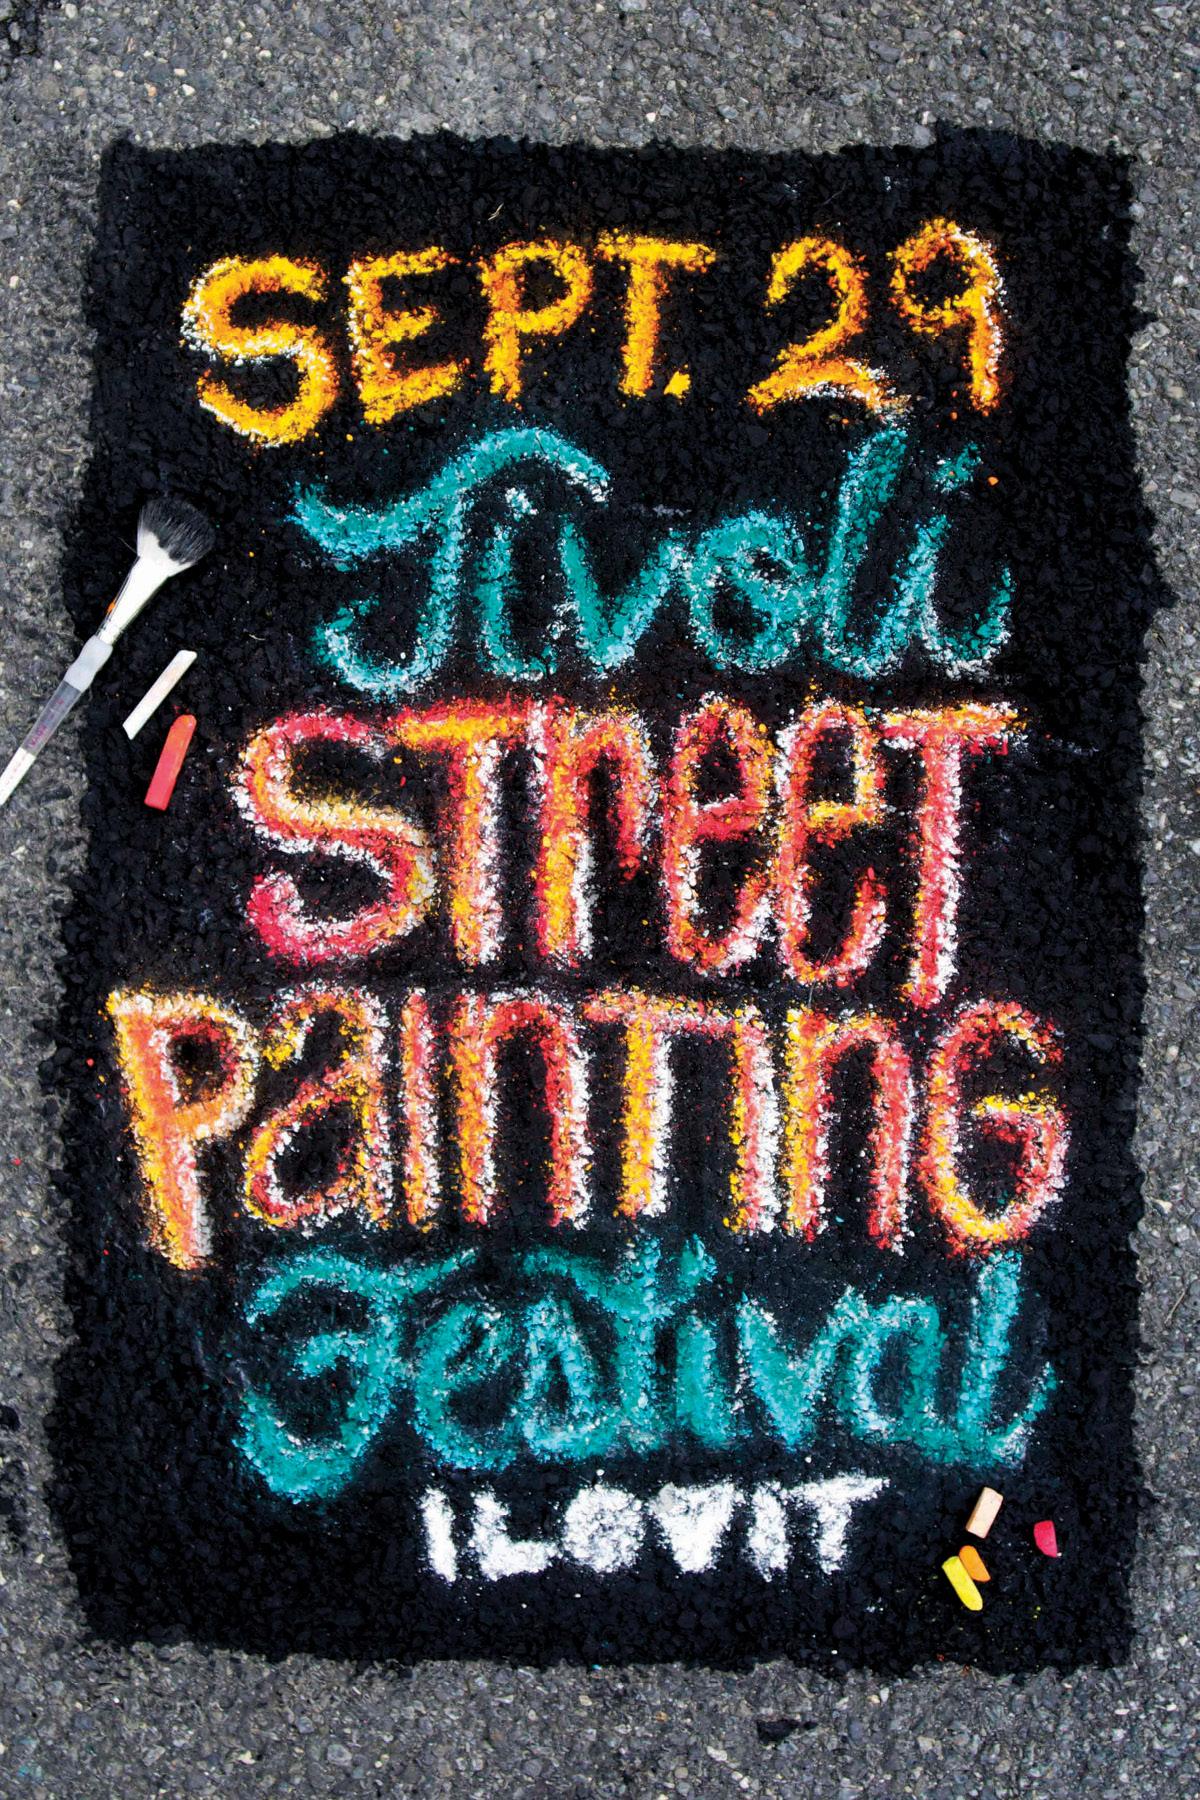 Tivoli Street Painting 2012